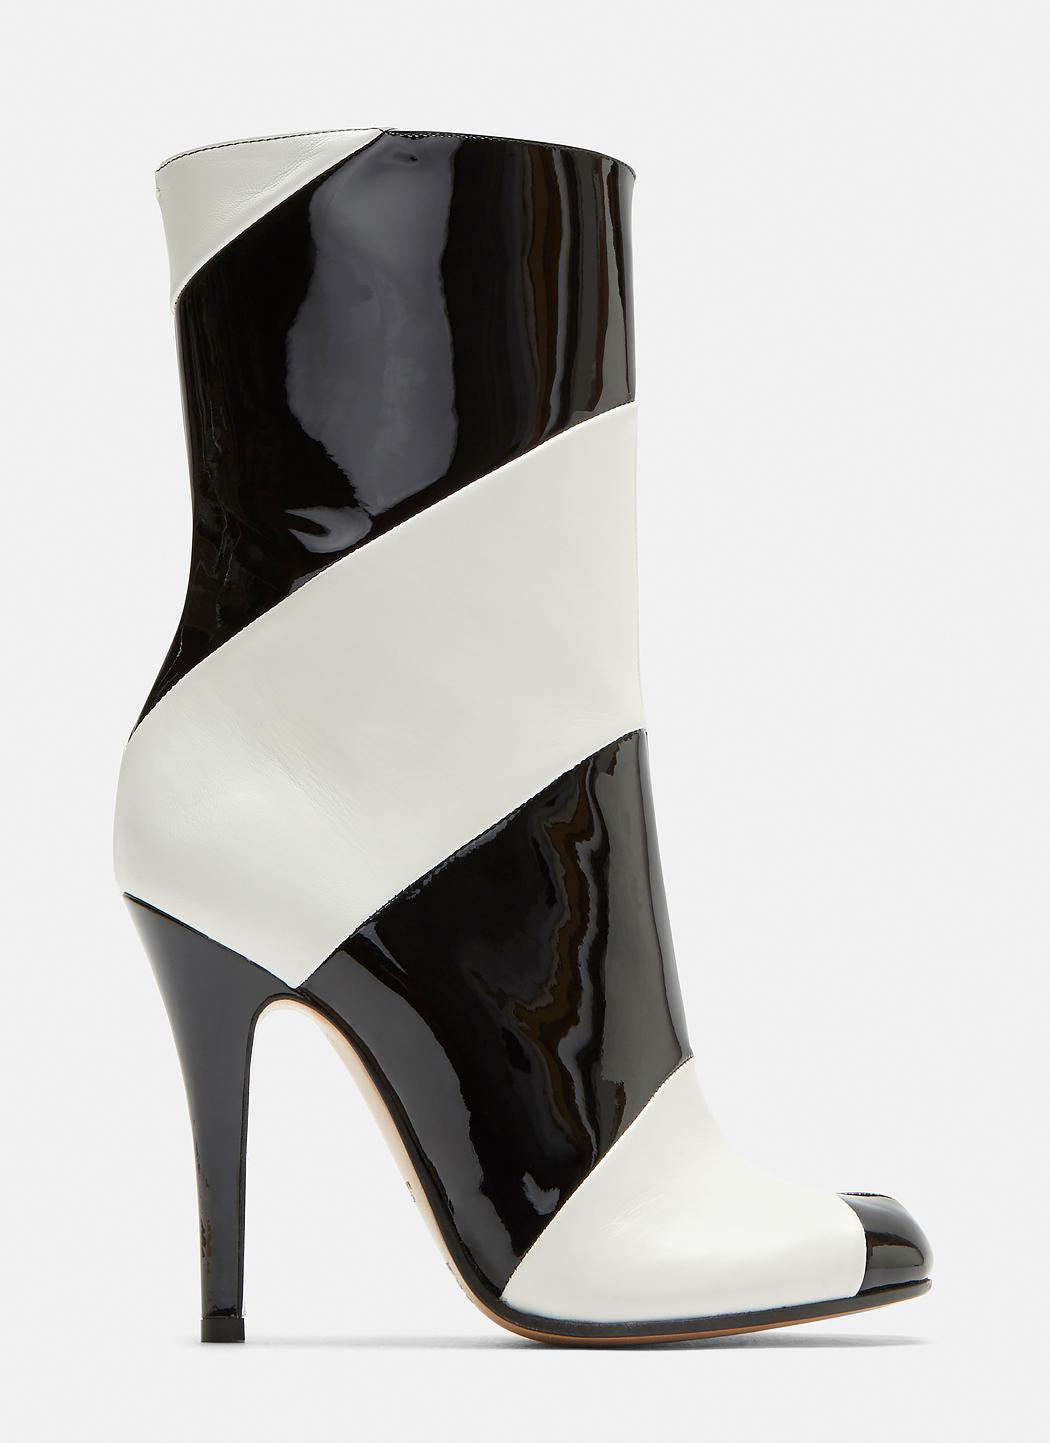 Tabi Striped Stiletto Ankle Boots Maison Martin Margiela 4h6fC5A4